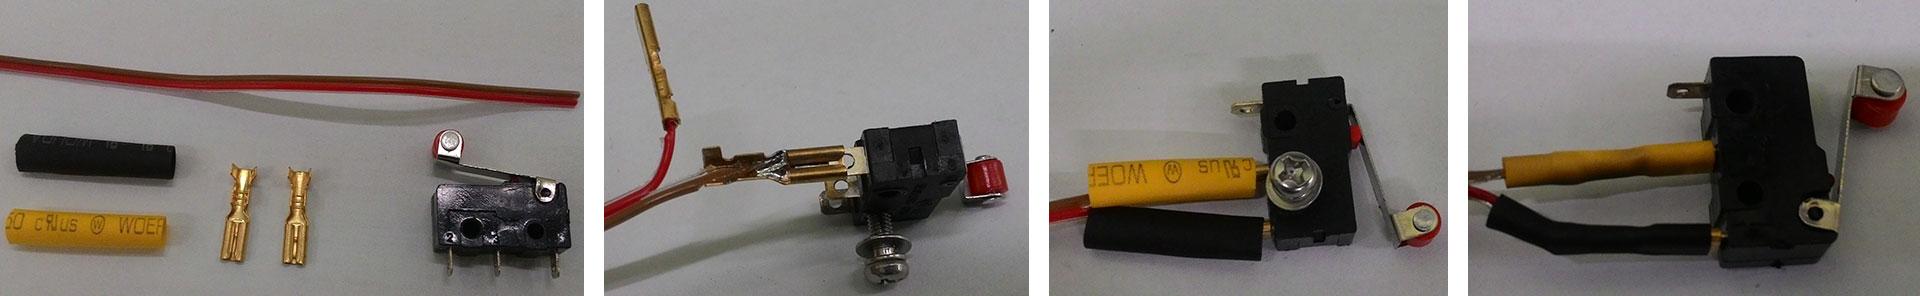 docs/images/week15/switch-wiring.jpg